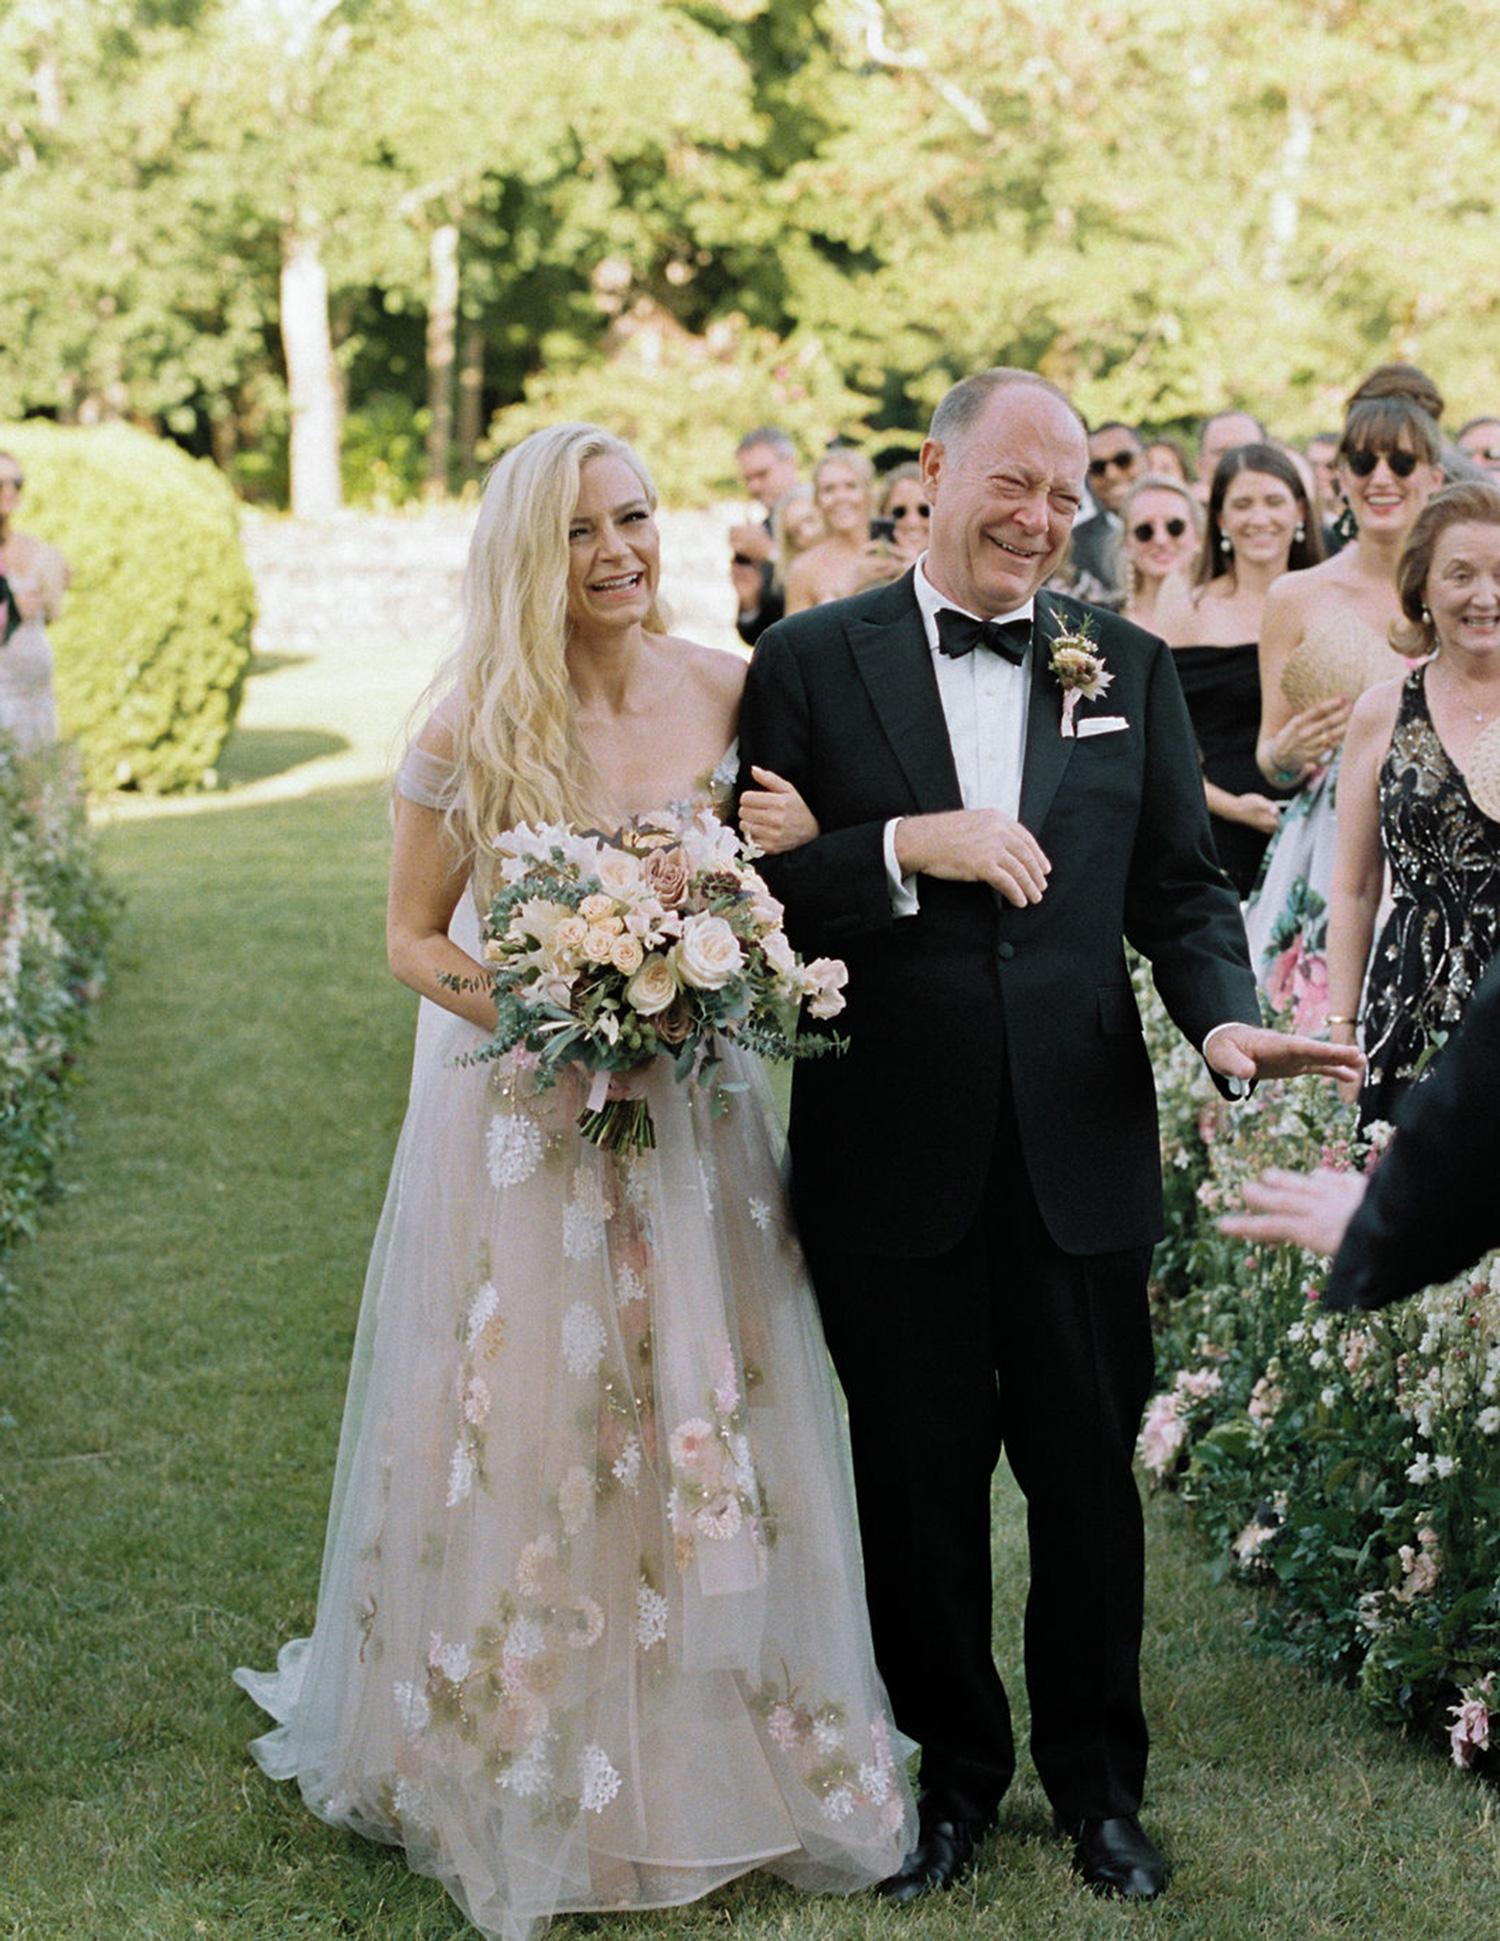 wedding processional Asheton and father